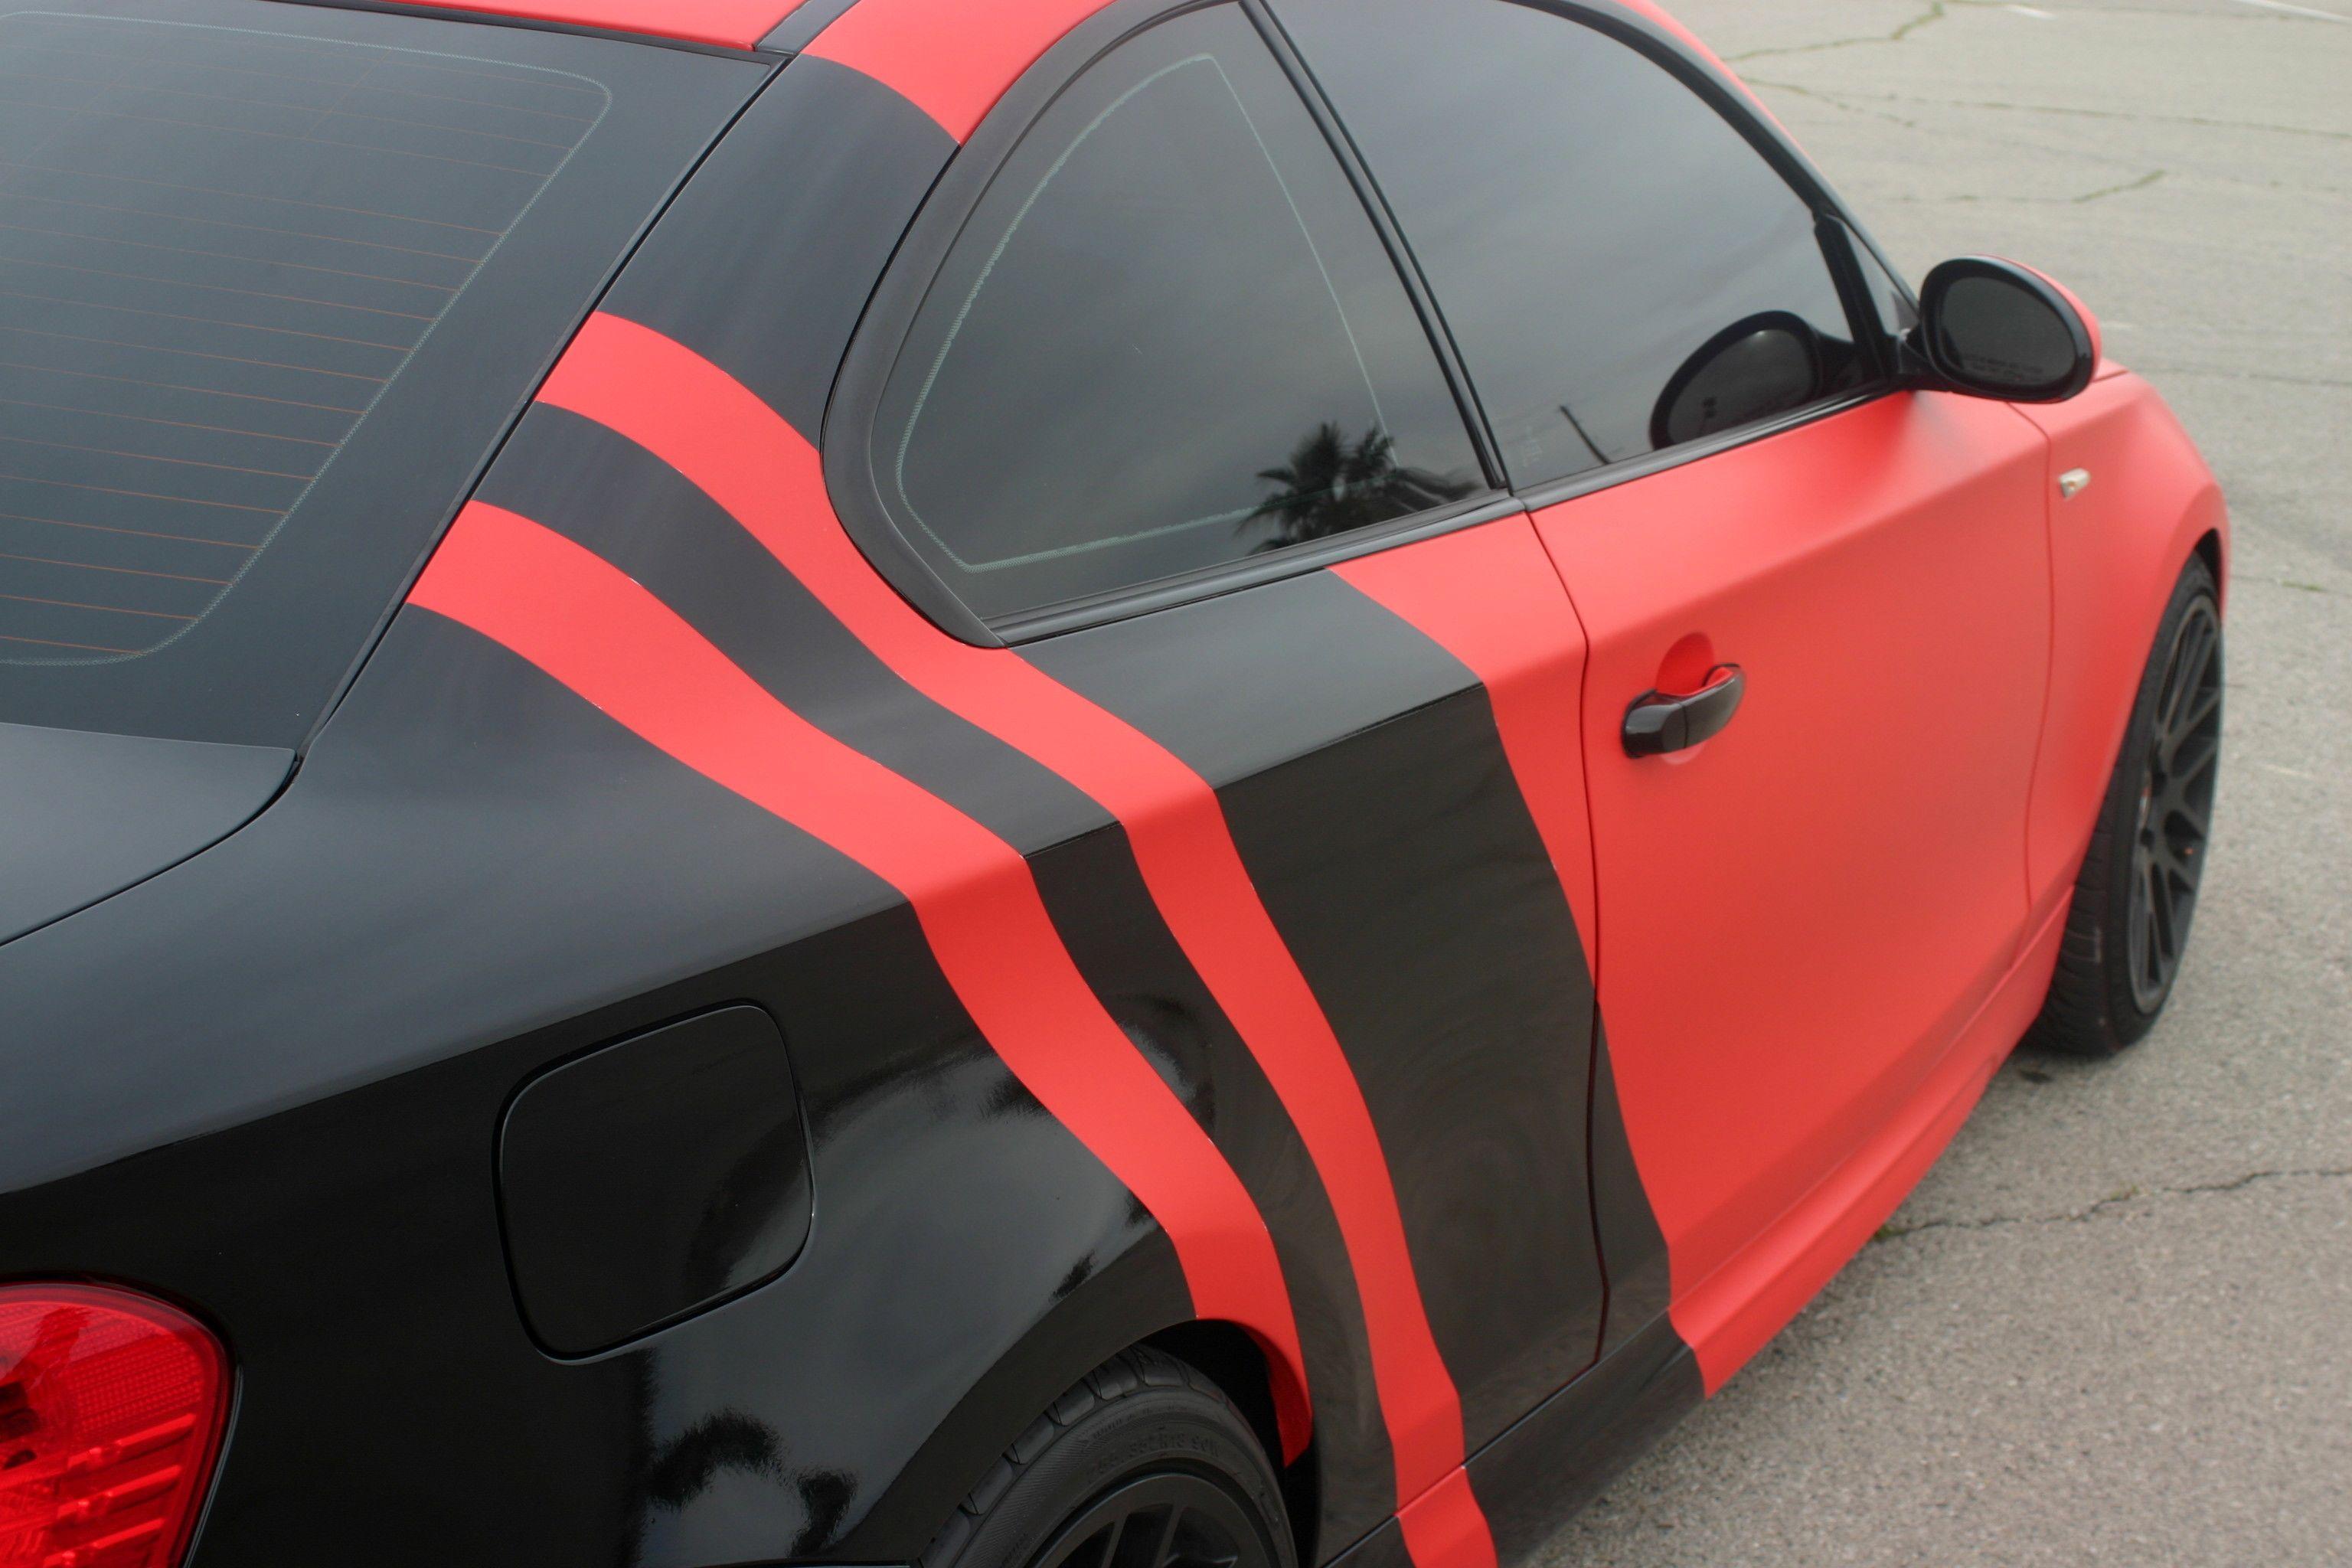 2008 Bmw 135i With 3m 1080 M13 Matte Red Vinyl With 3m 1080 G12 Gloss Black Vinyl Eyecandyvehiclewraps Lasvegas Bmw Bmw1 Black Vinyl Matte Red Gloss Black